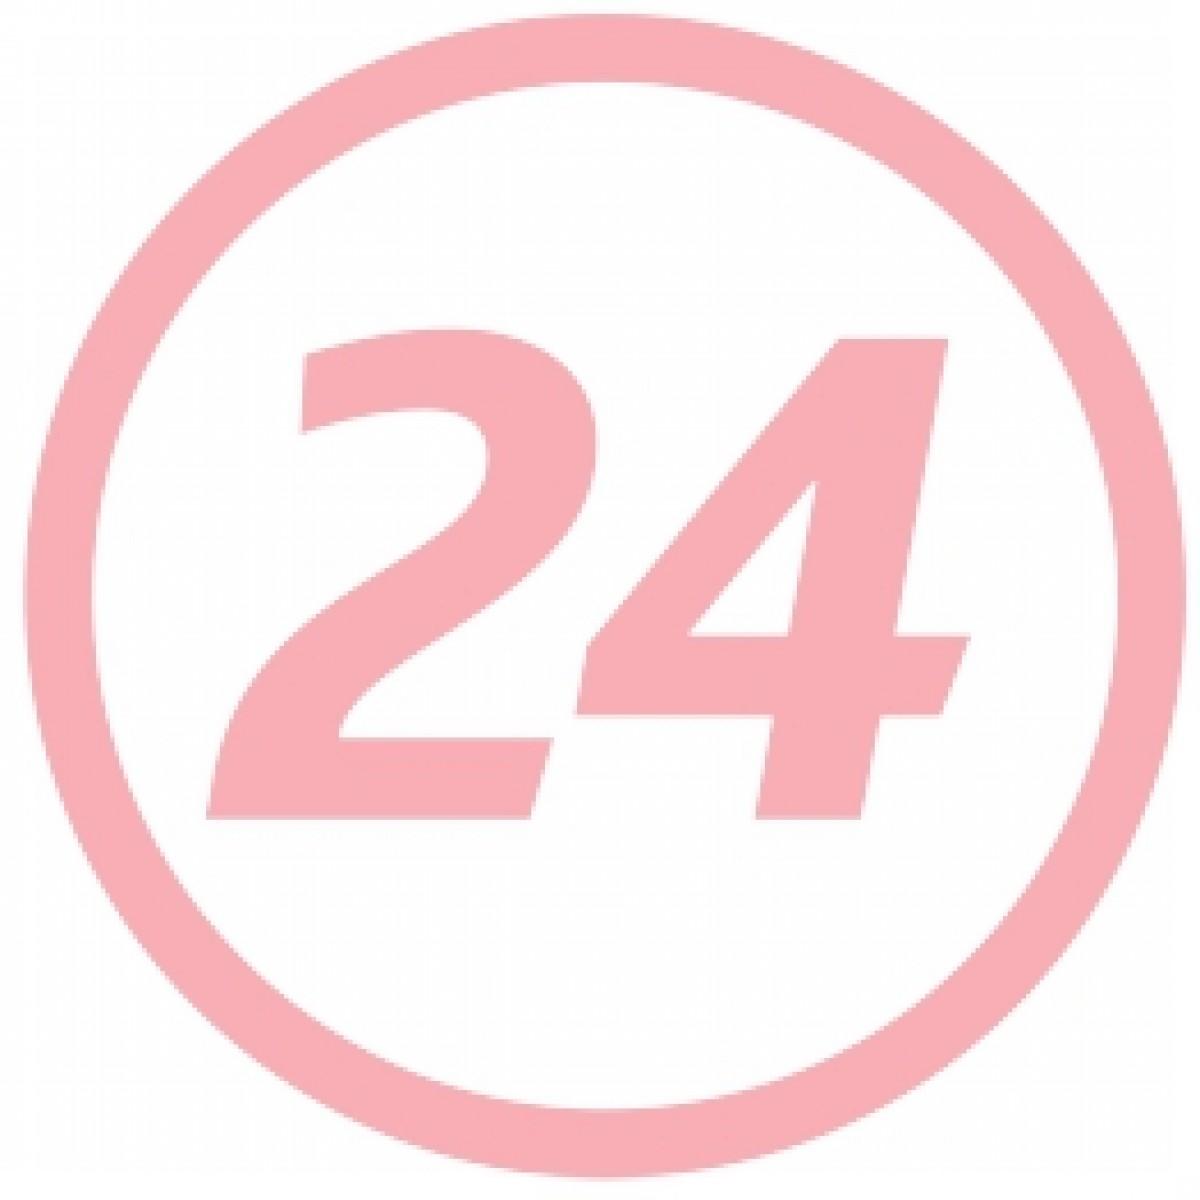 Zdrovit Calciu + Vitamina C Comprimate Efervescente, Comprimate, 20buc